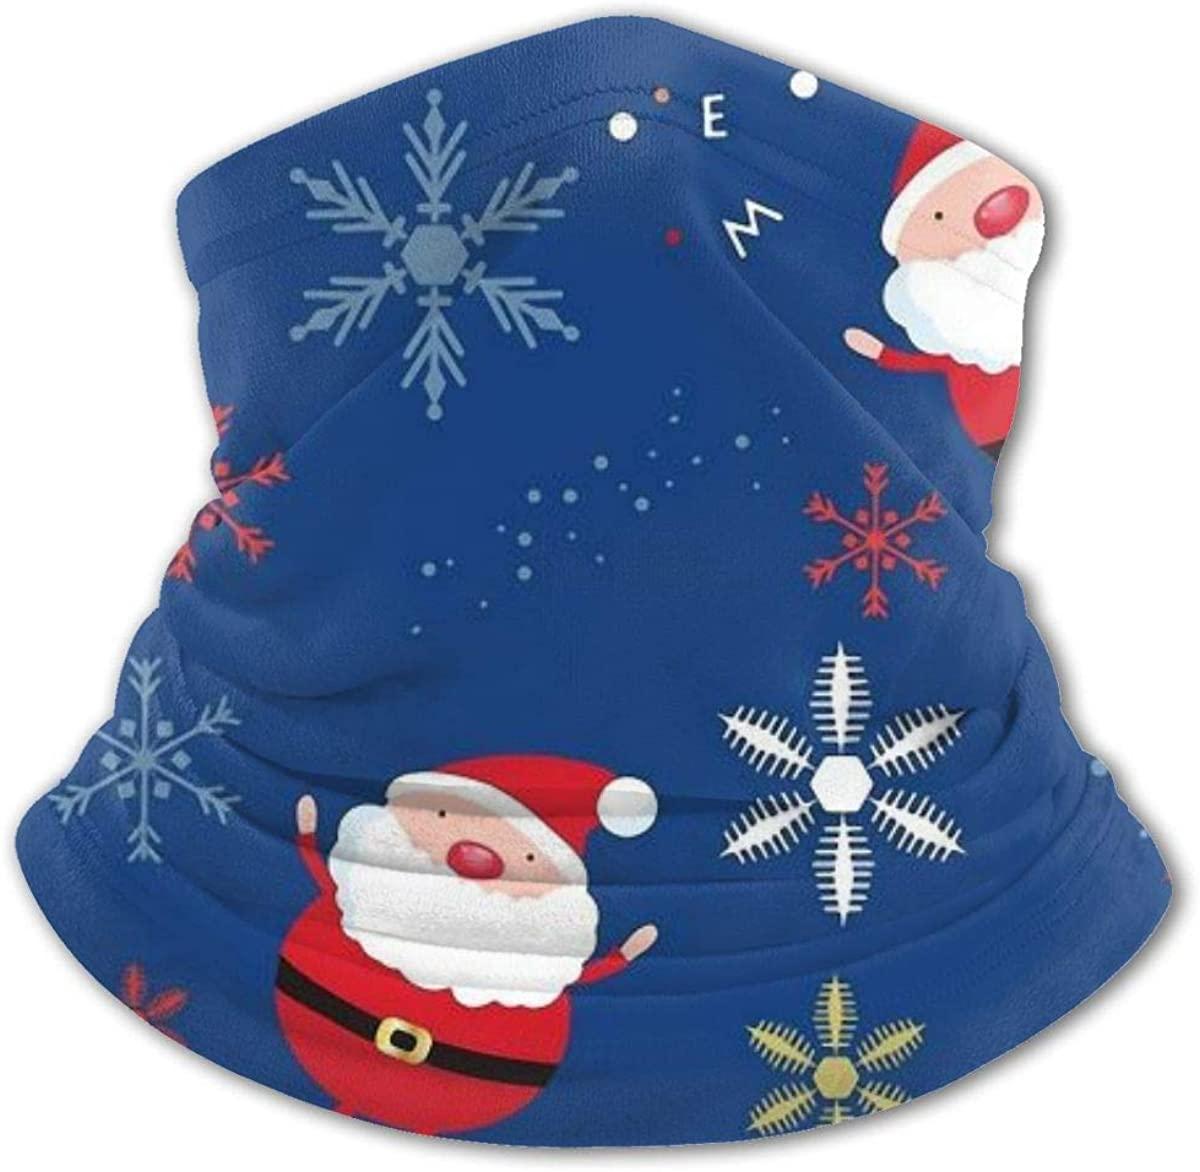 Santa Claus Headwear For Girls And Boys, Head Wrap, Neck Gaiter, Headband, Tenn Fishing Mask, Magic Scarf, Tube Mask, Face Bandana Mask For Camping Running Cycling